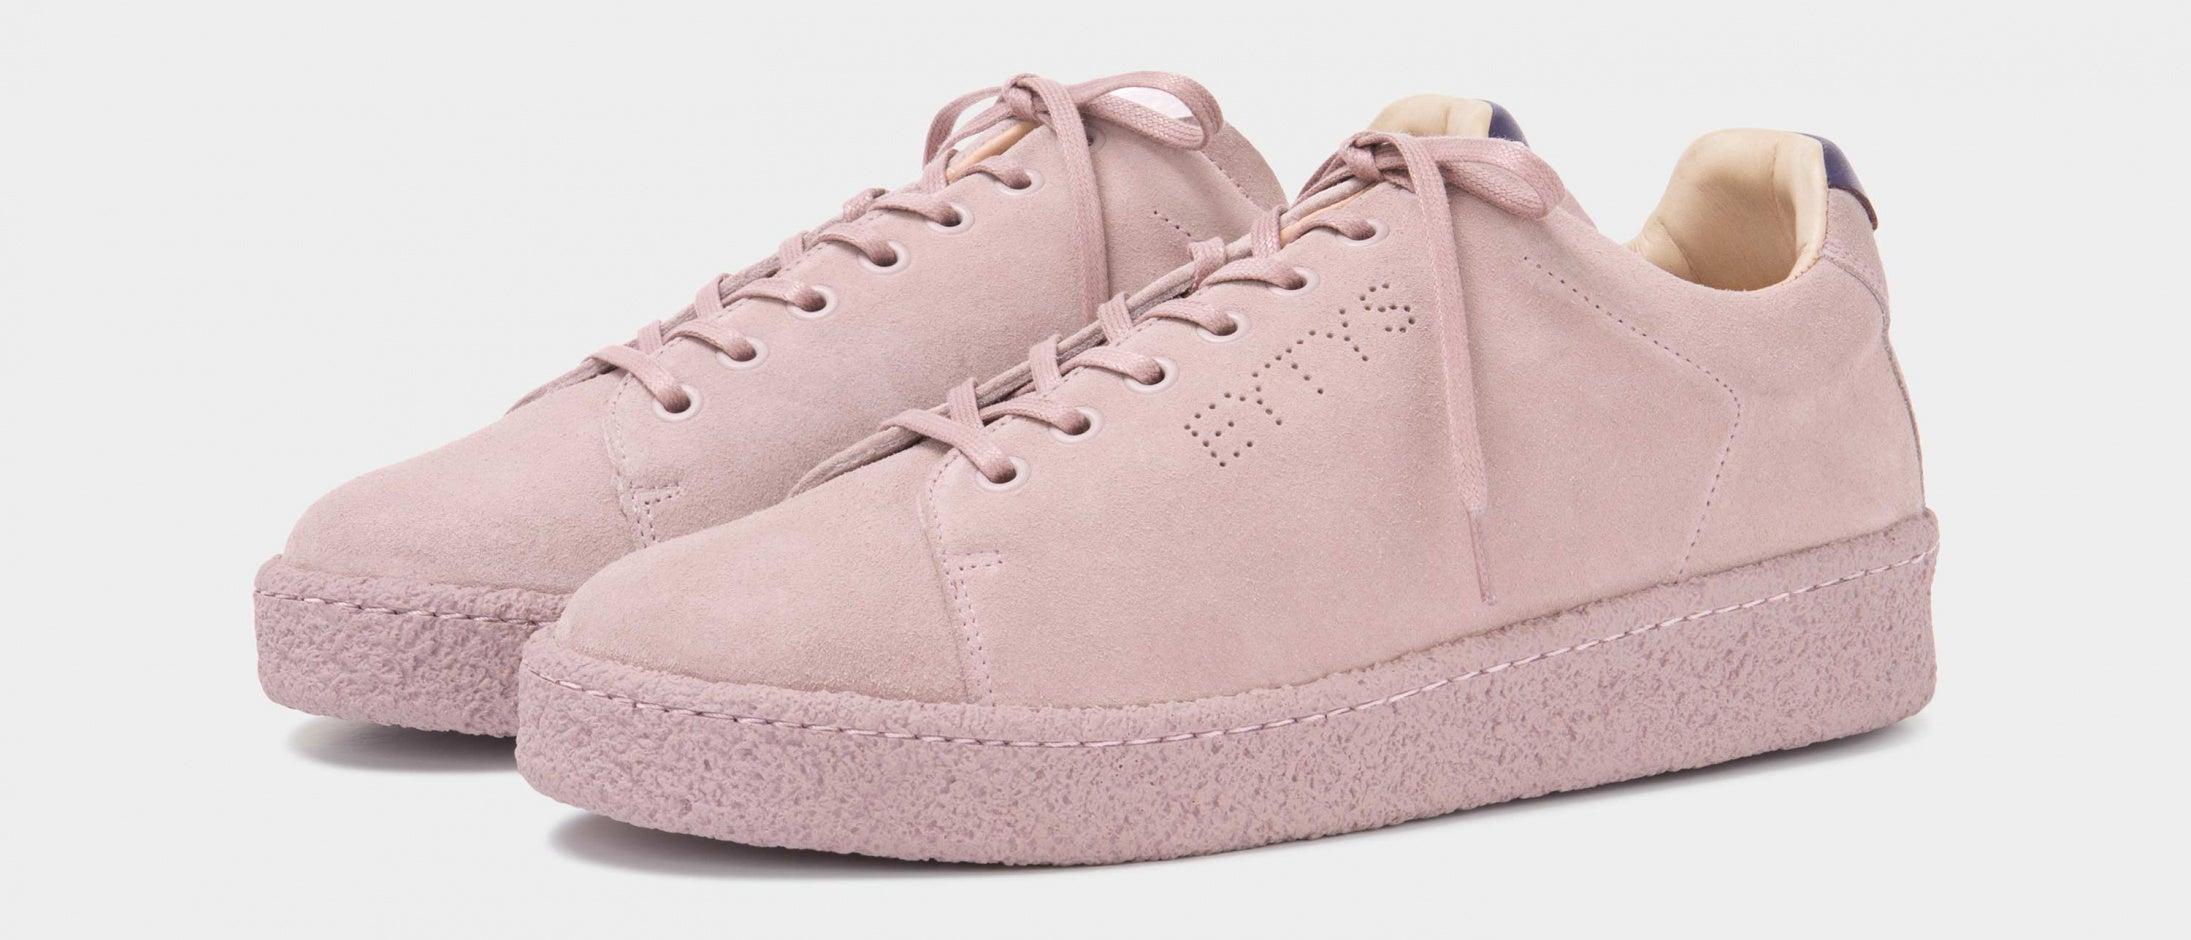 buy popular 7c52c 1e5e9 Fila + Original Fitness Ripple Satin Sneaker